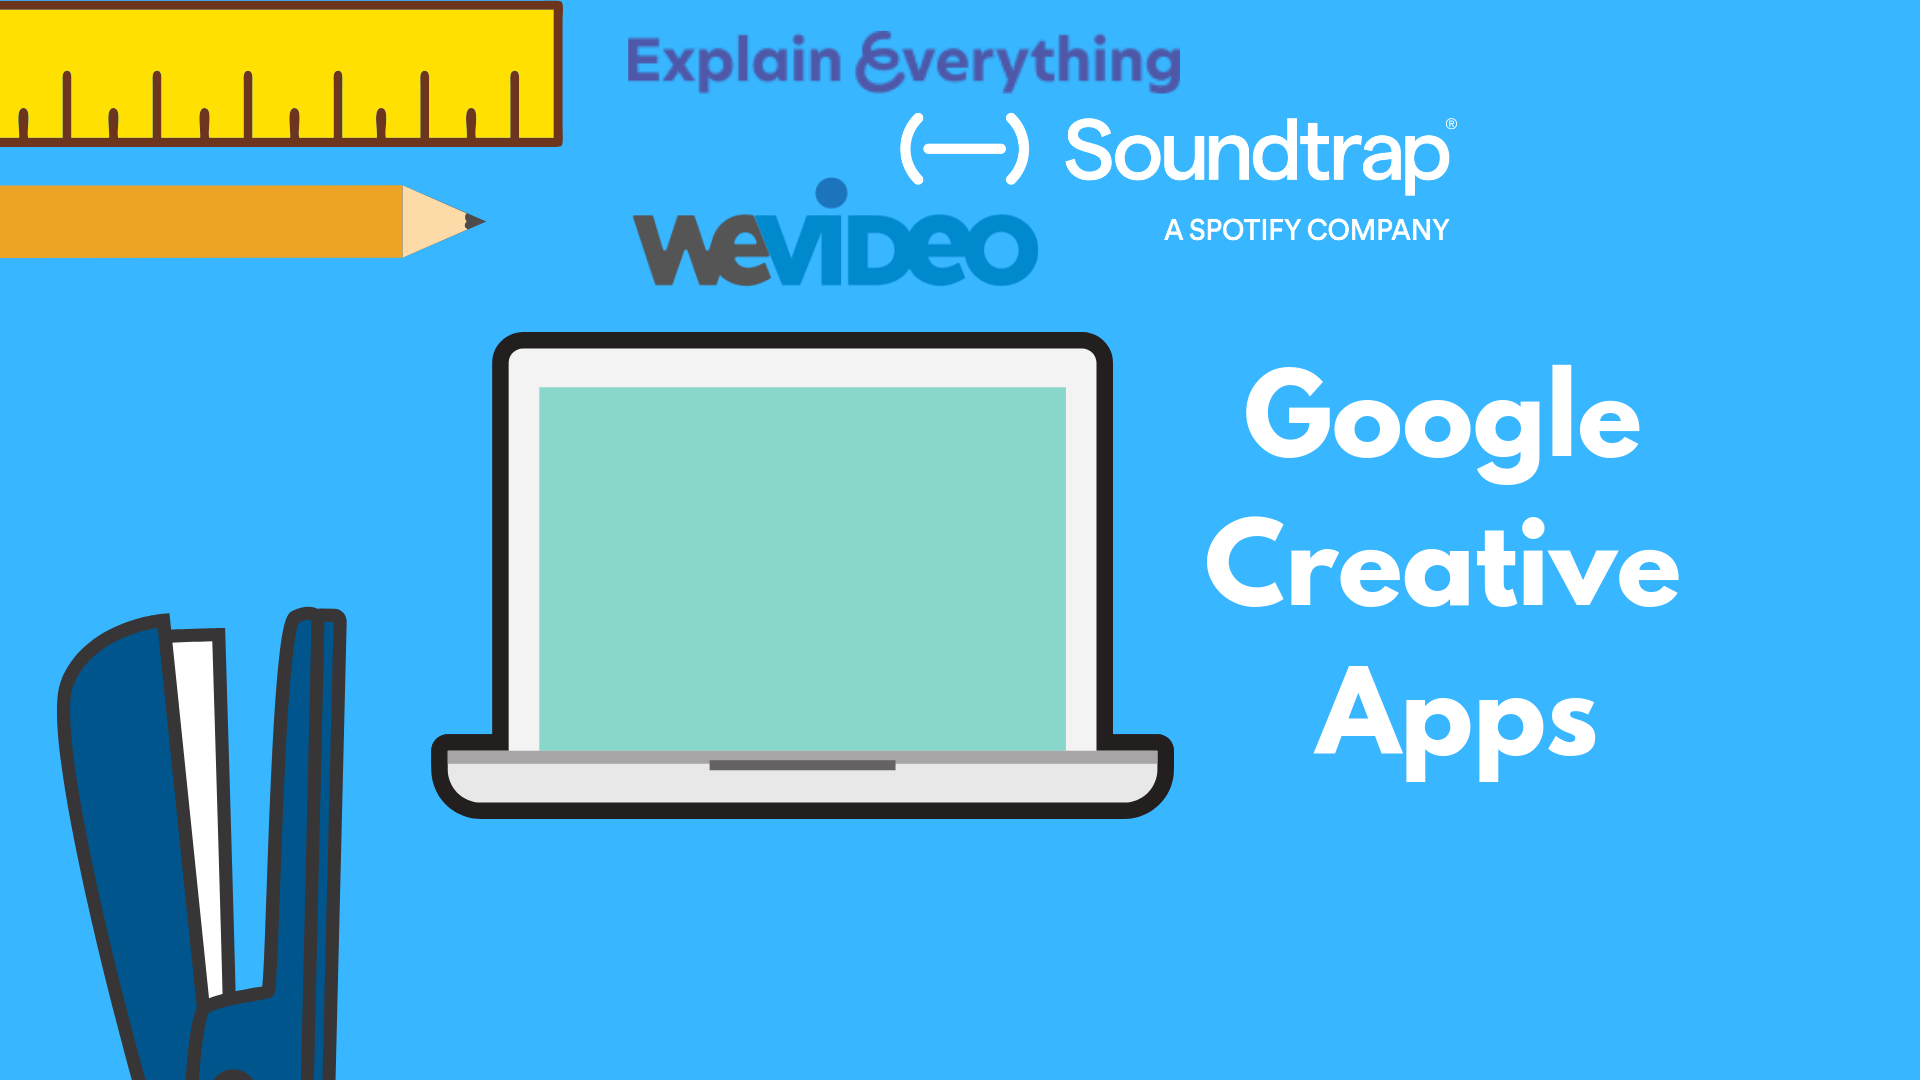 Google Creative Apps Blog Header